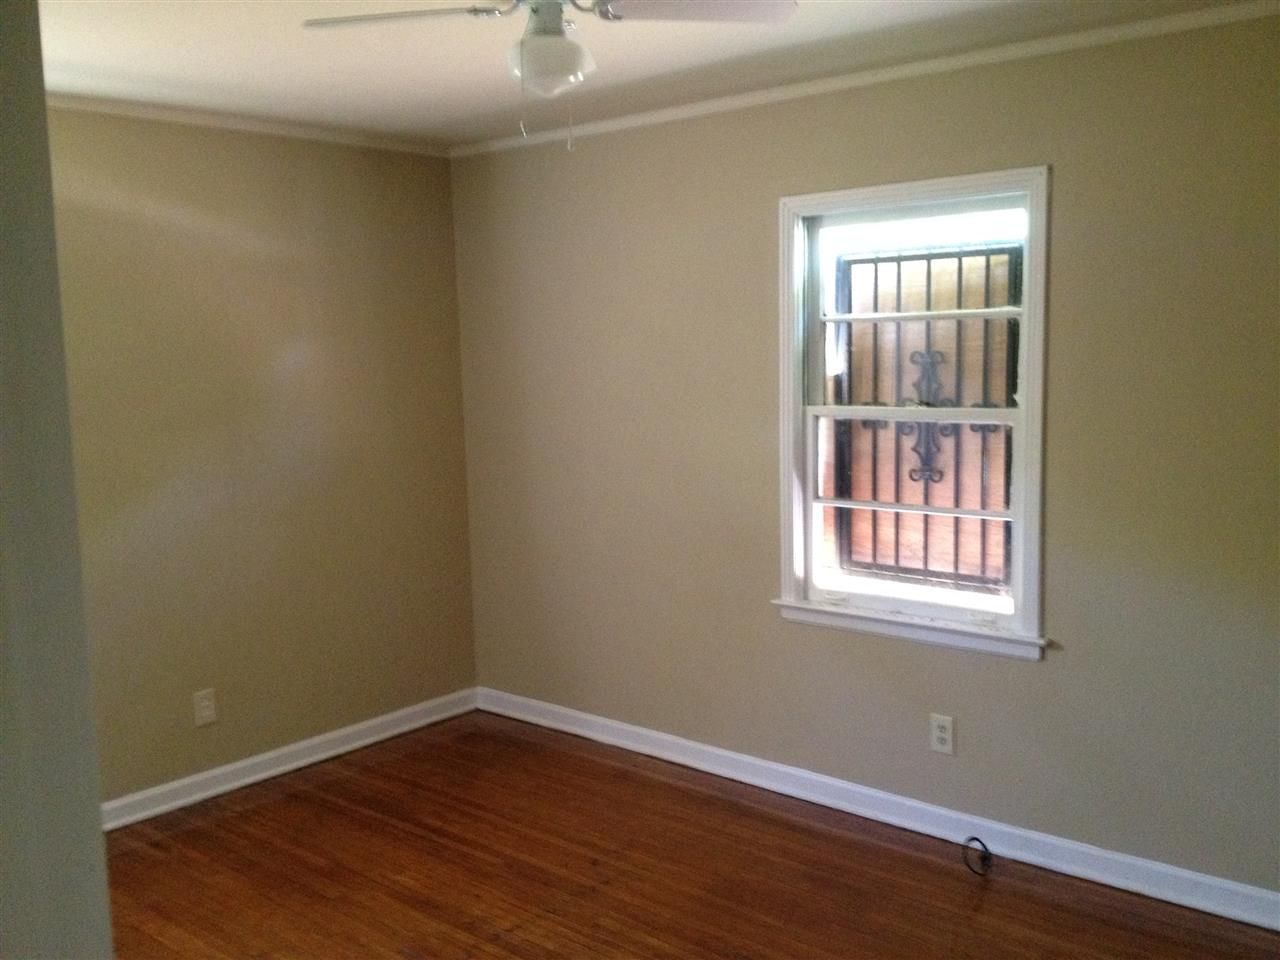 1352 Canfield Memphis, TN 38127 - MLS #: 10019963